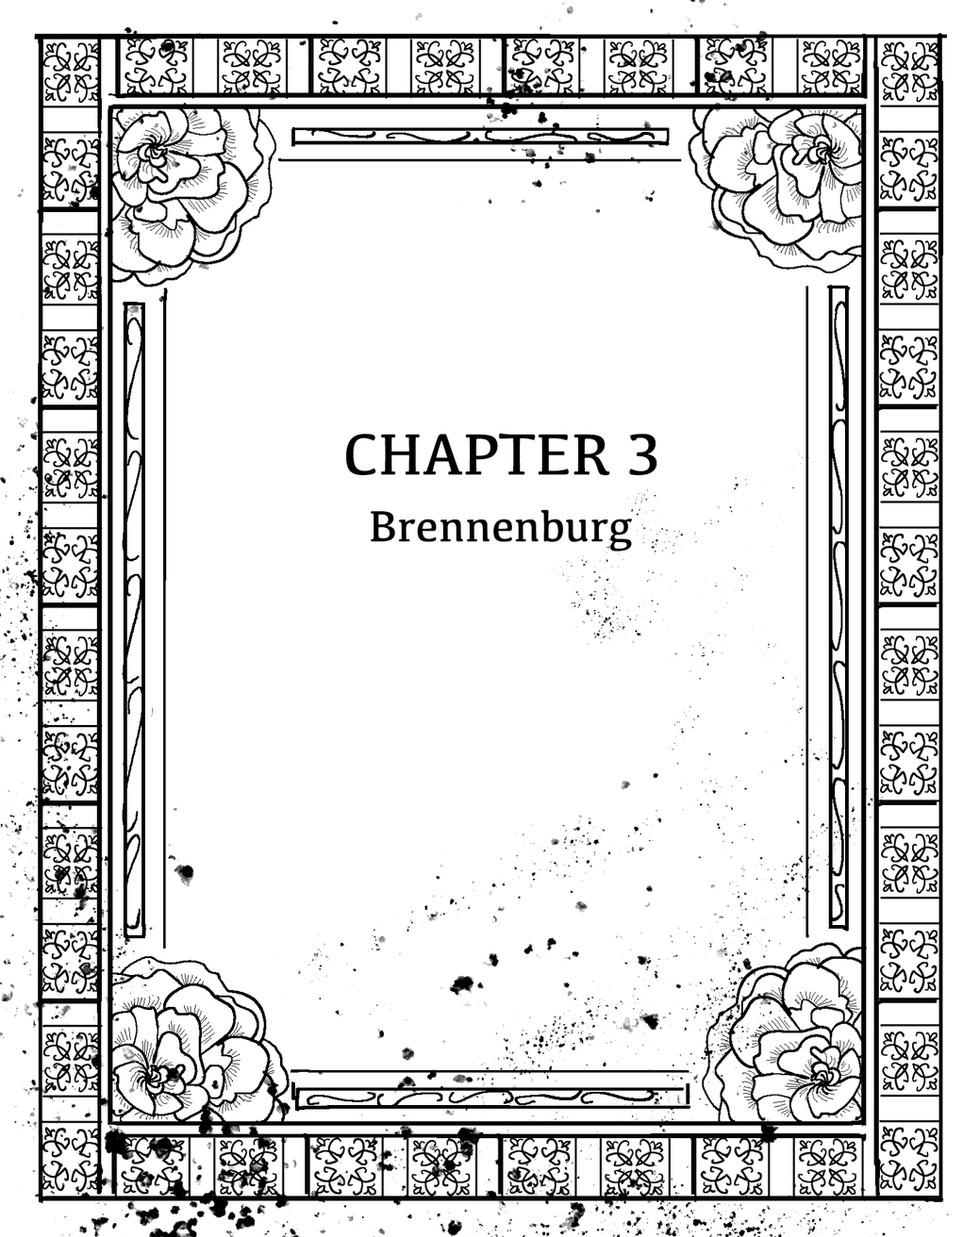 Amnesia_ChapterCard_3.jpg